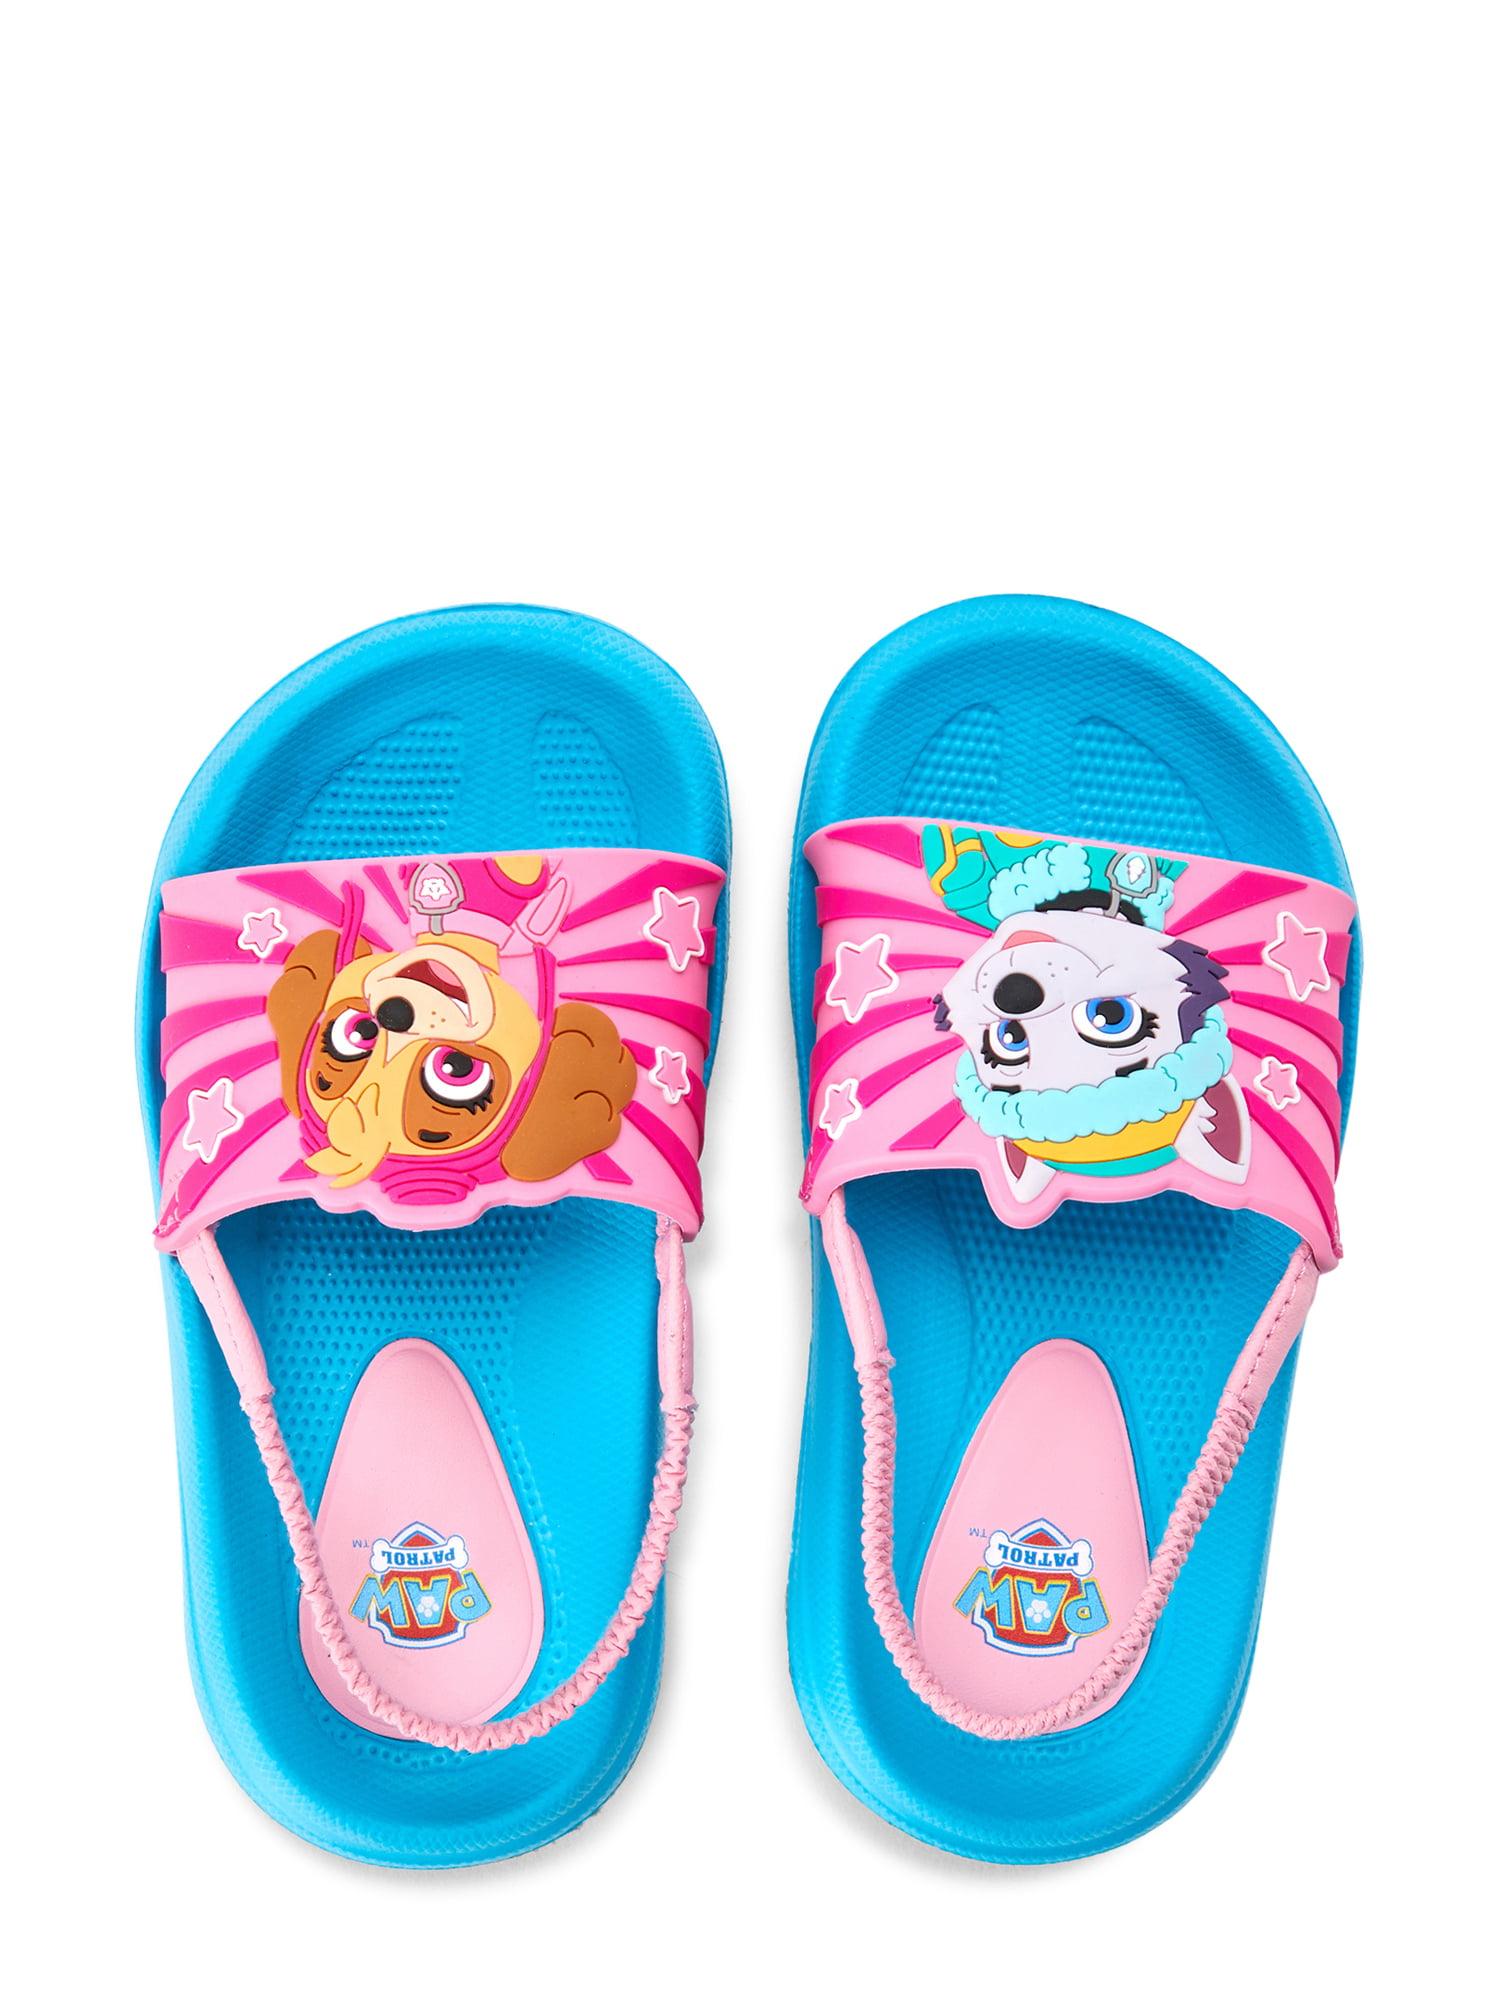 Nickelodeon Paw Patrol Slide Sandal